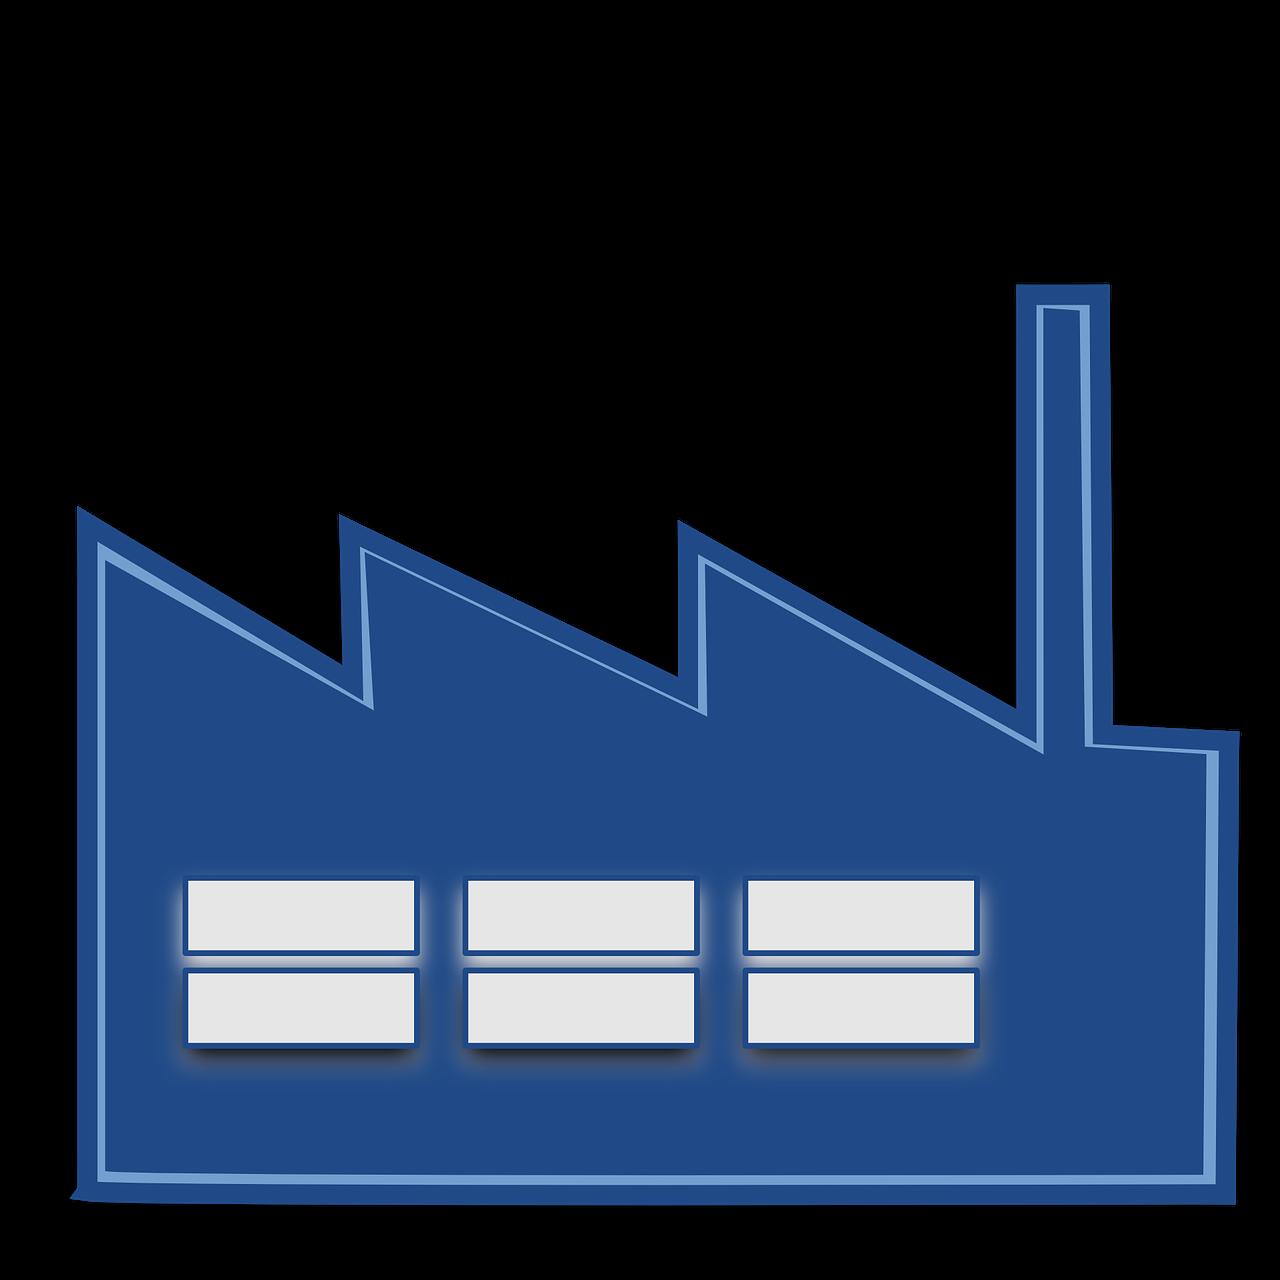 factory-295222_1280